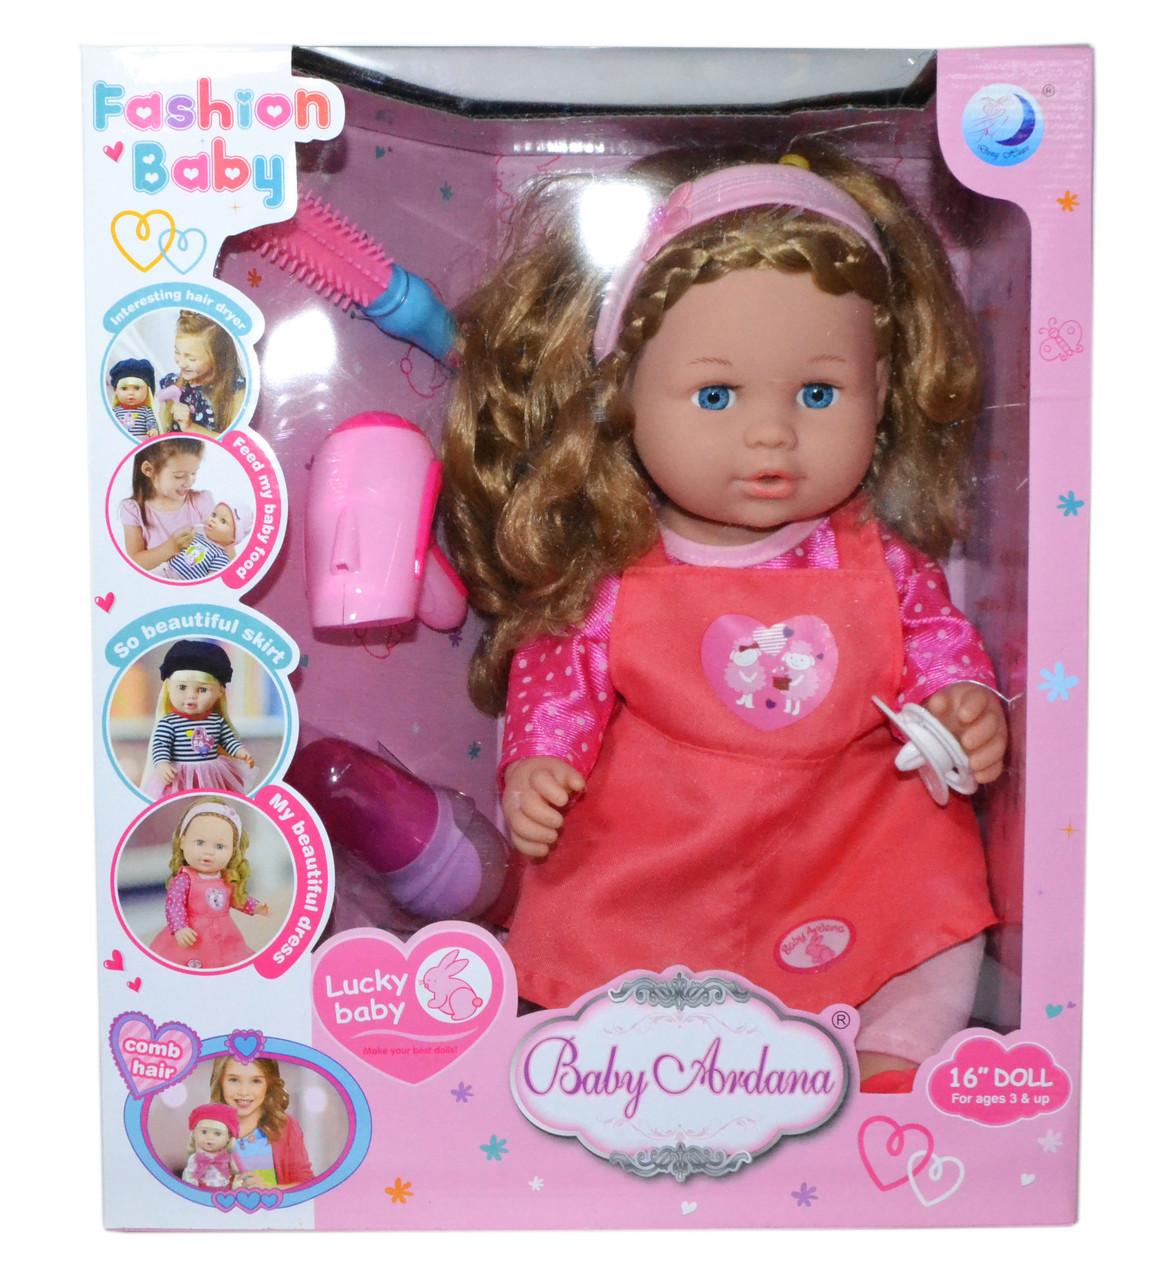 DH2232C Baby Ardana кукла пупс (фен,расческа,бутылочка,соска) 38*32см